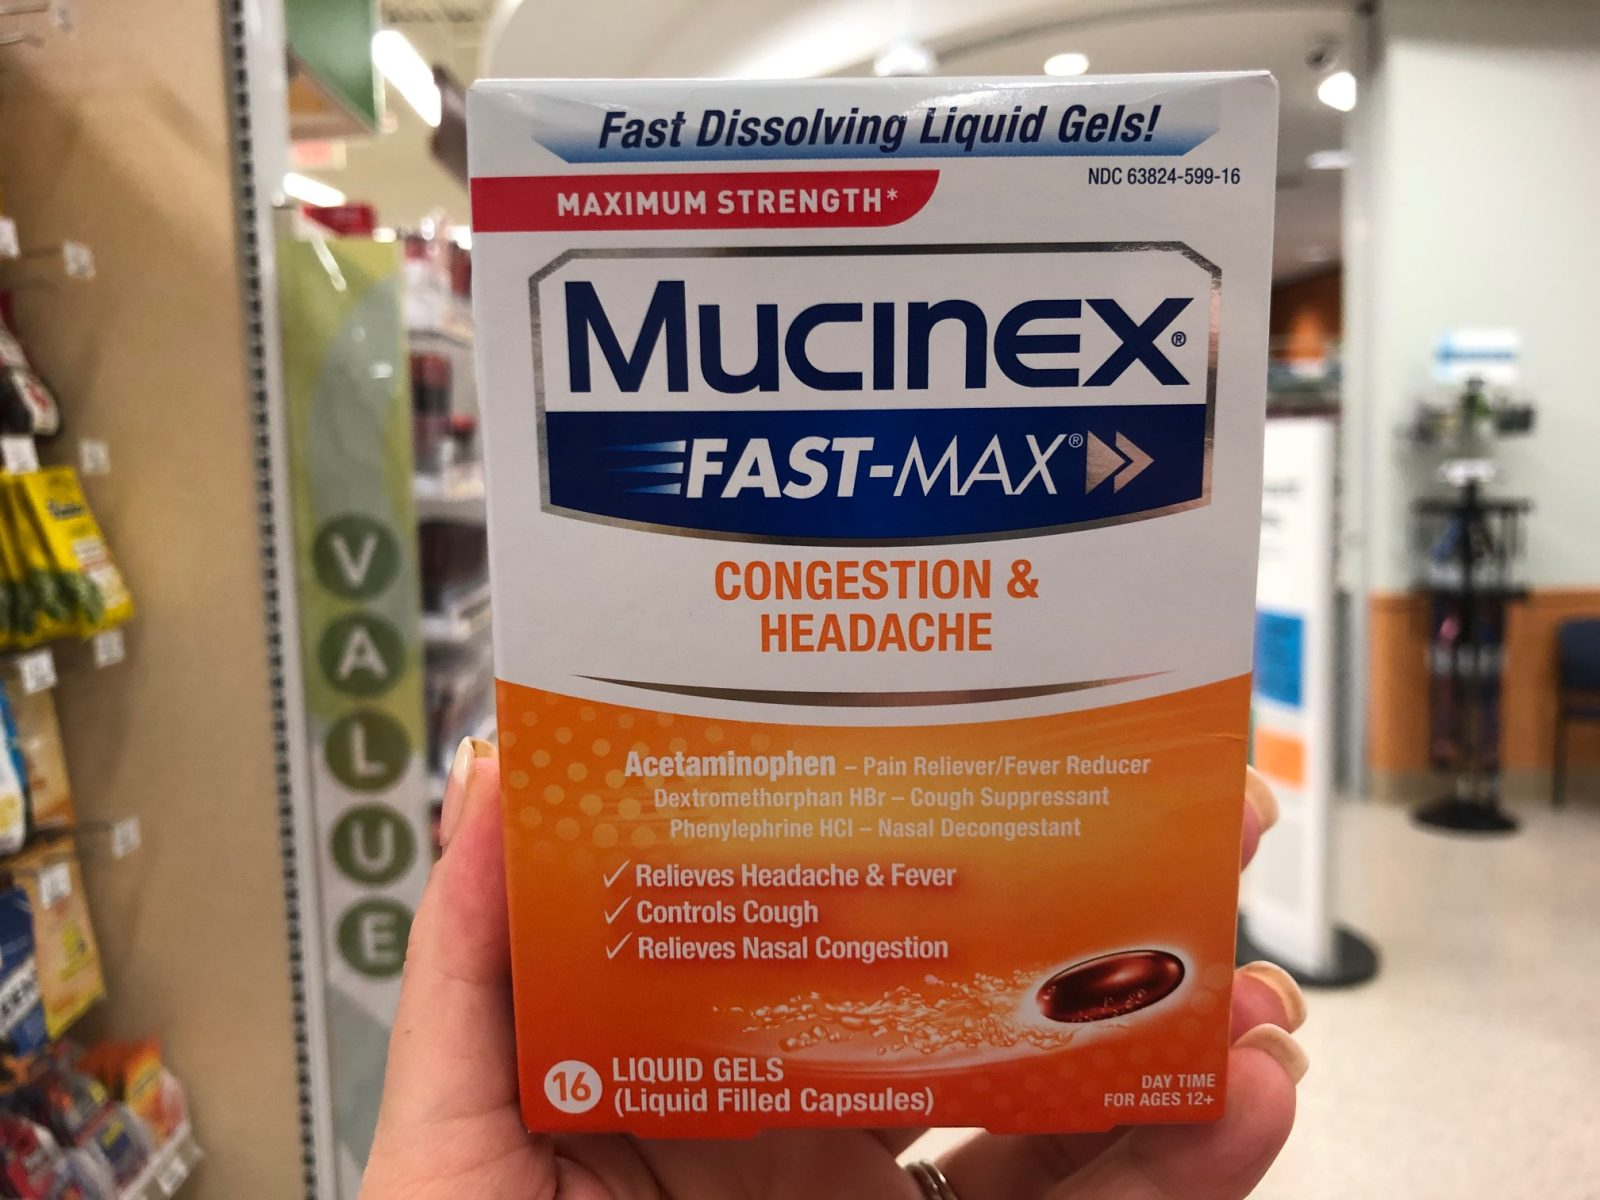 Mucinex As Low As $6.49 At Publix (reg $12.49) on I Heart Publix 3